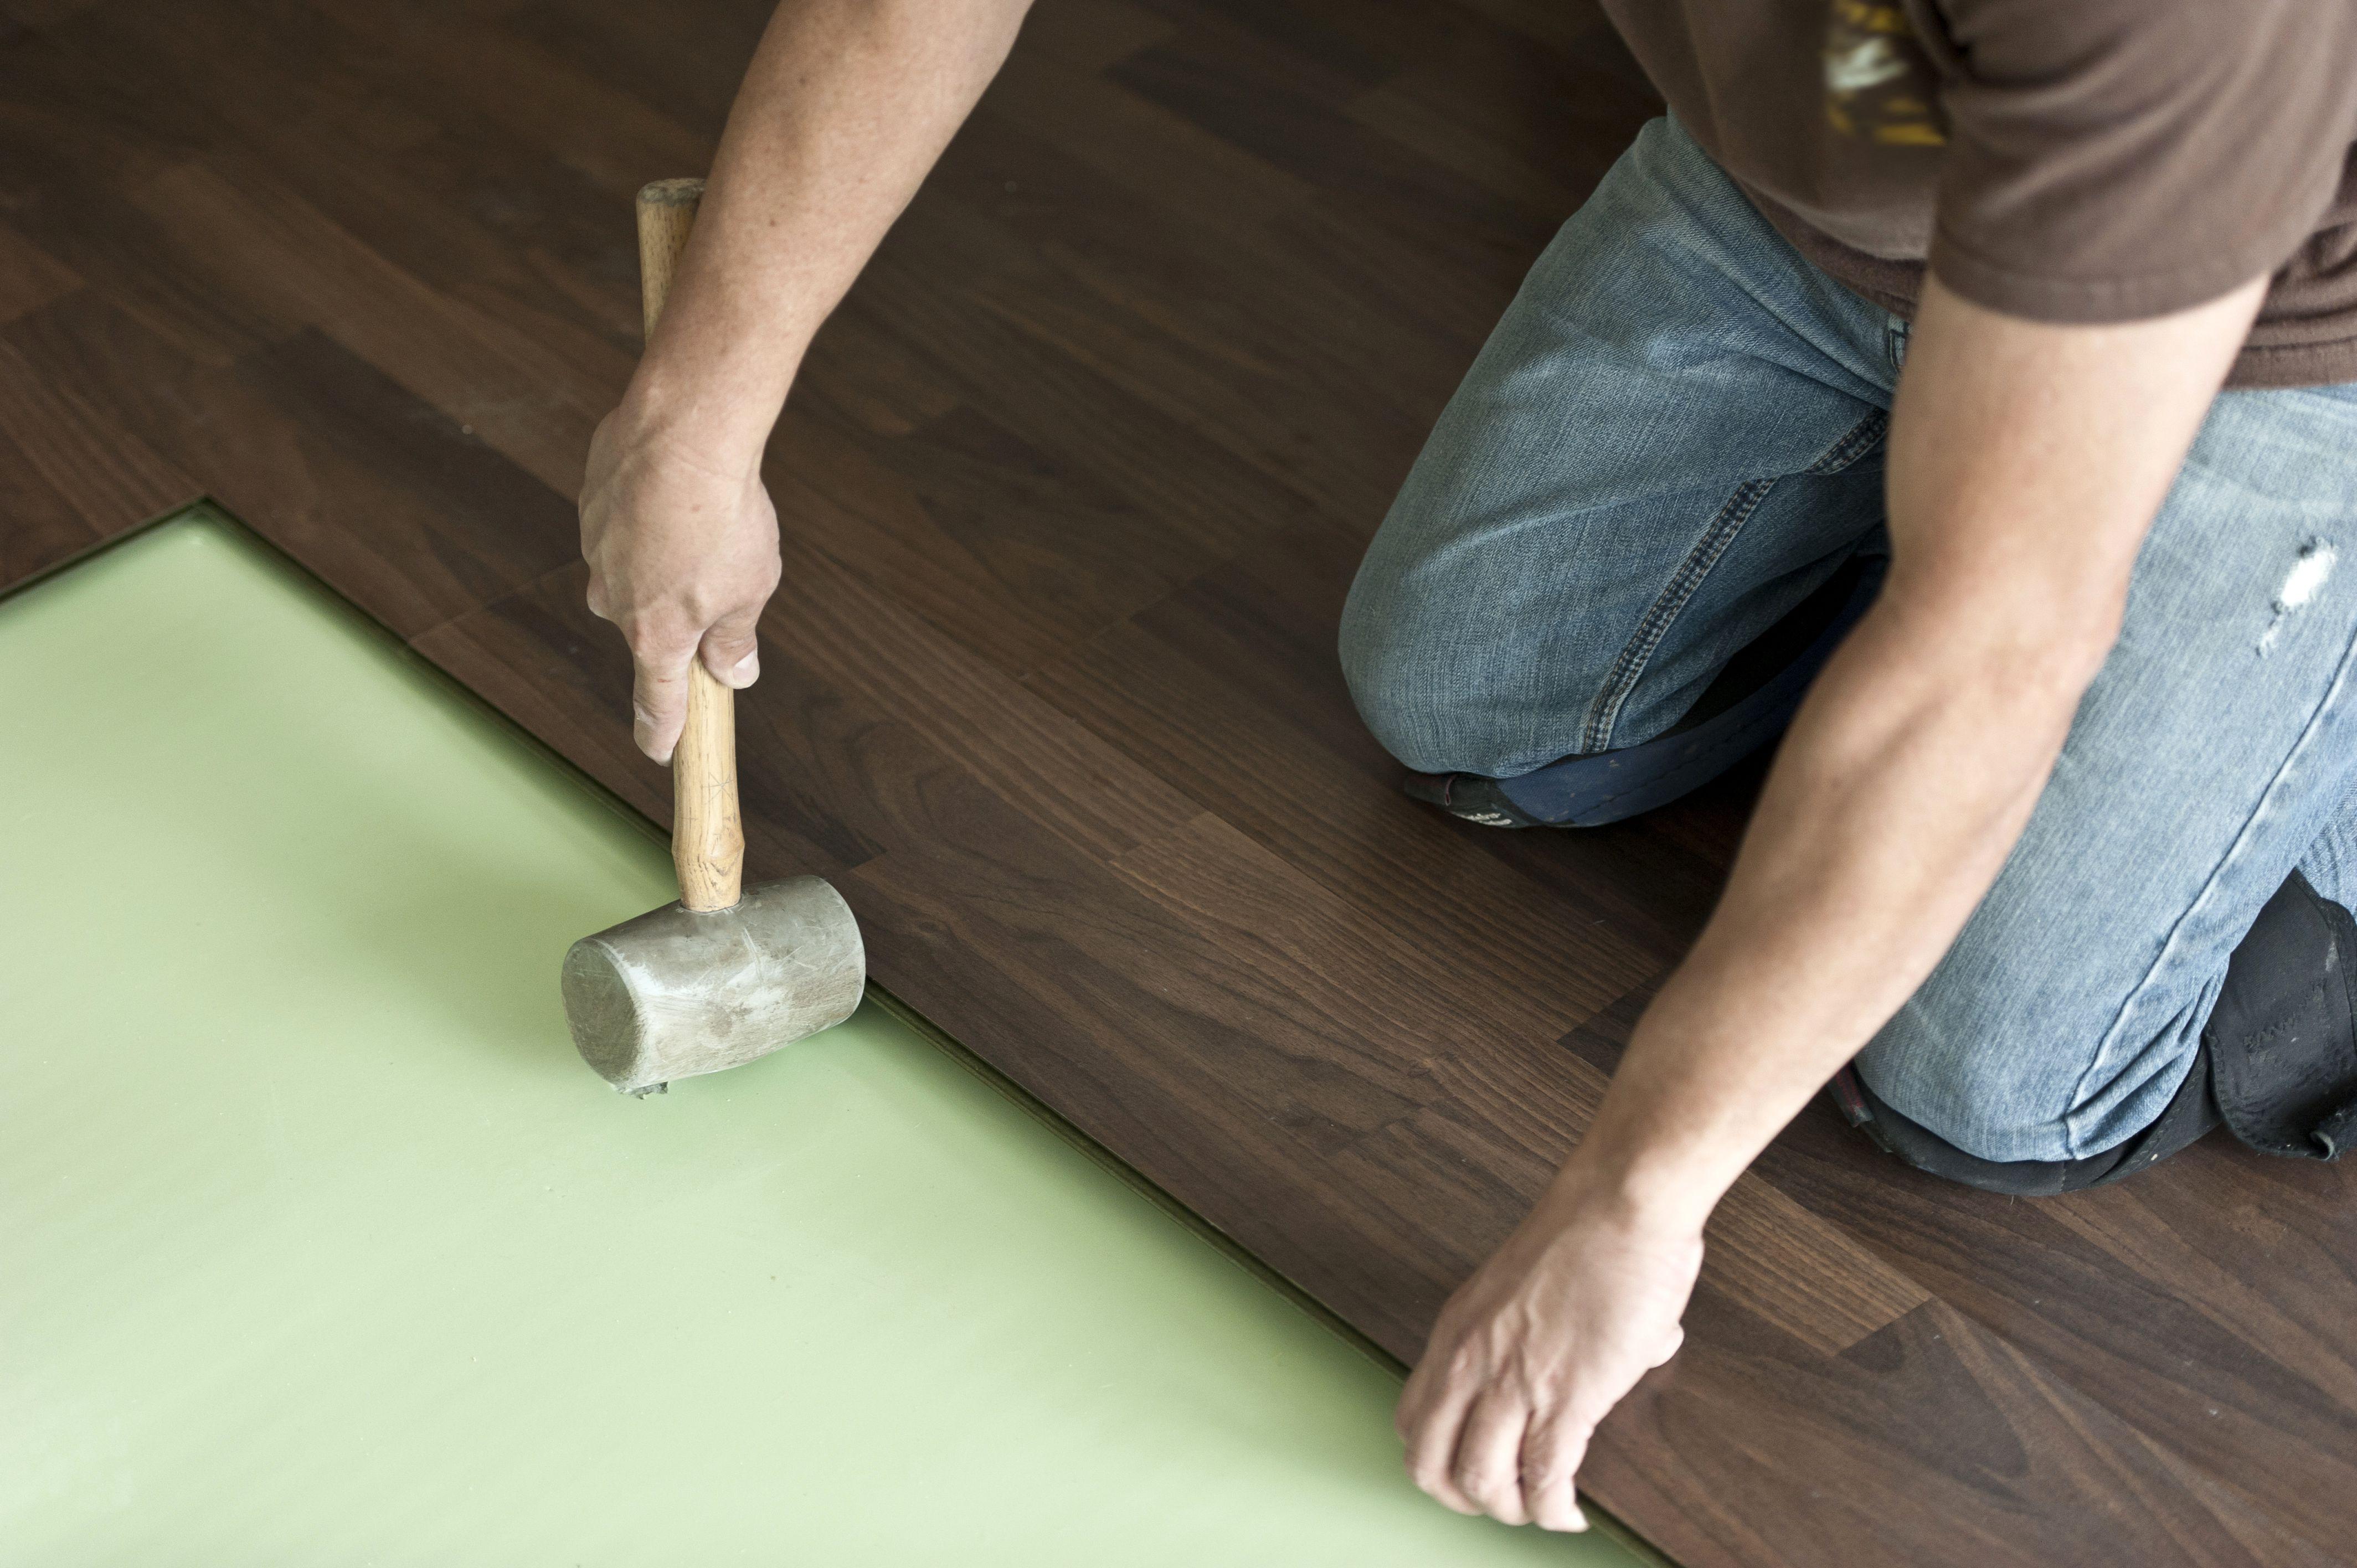 5 16 inch solid hardwood flooring of can a foam pad be use under solid hardwood flooring inside installing hardwood floor 155149312 57e967d45f9b586c35ade84a